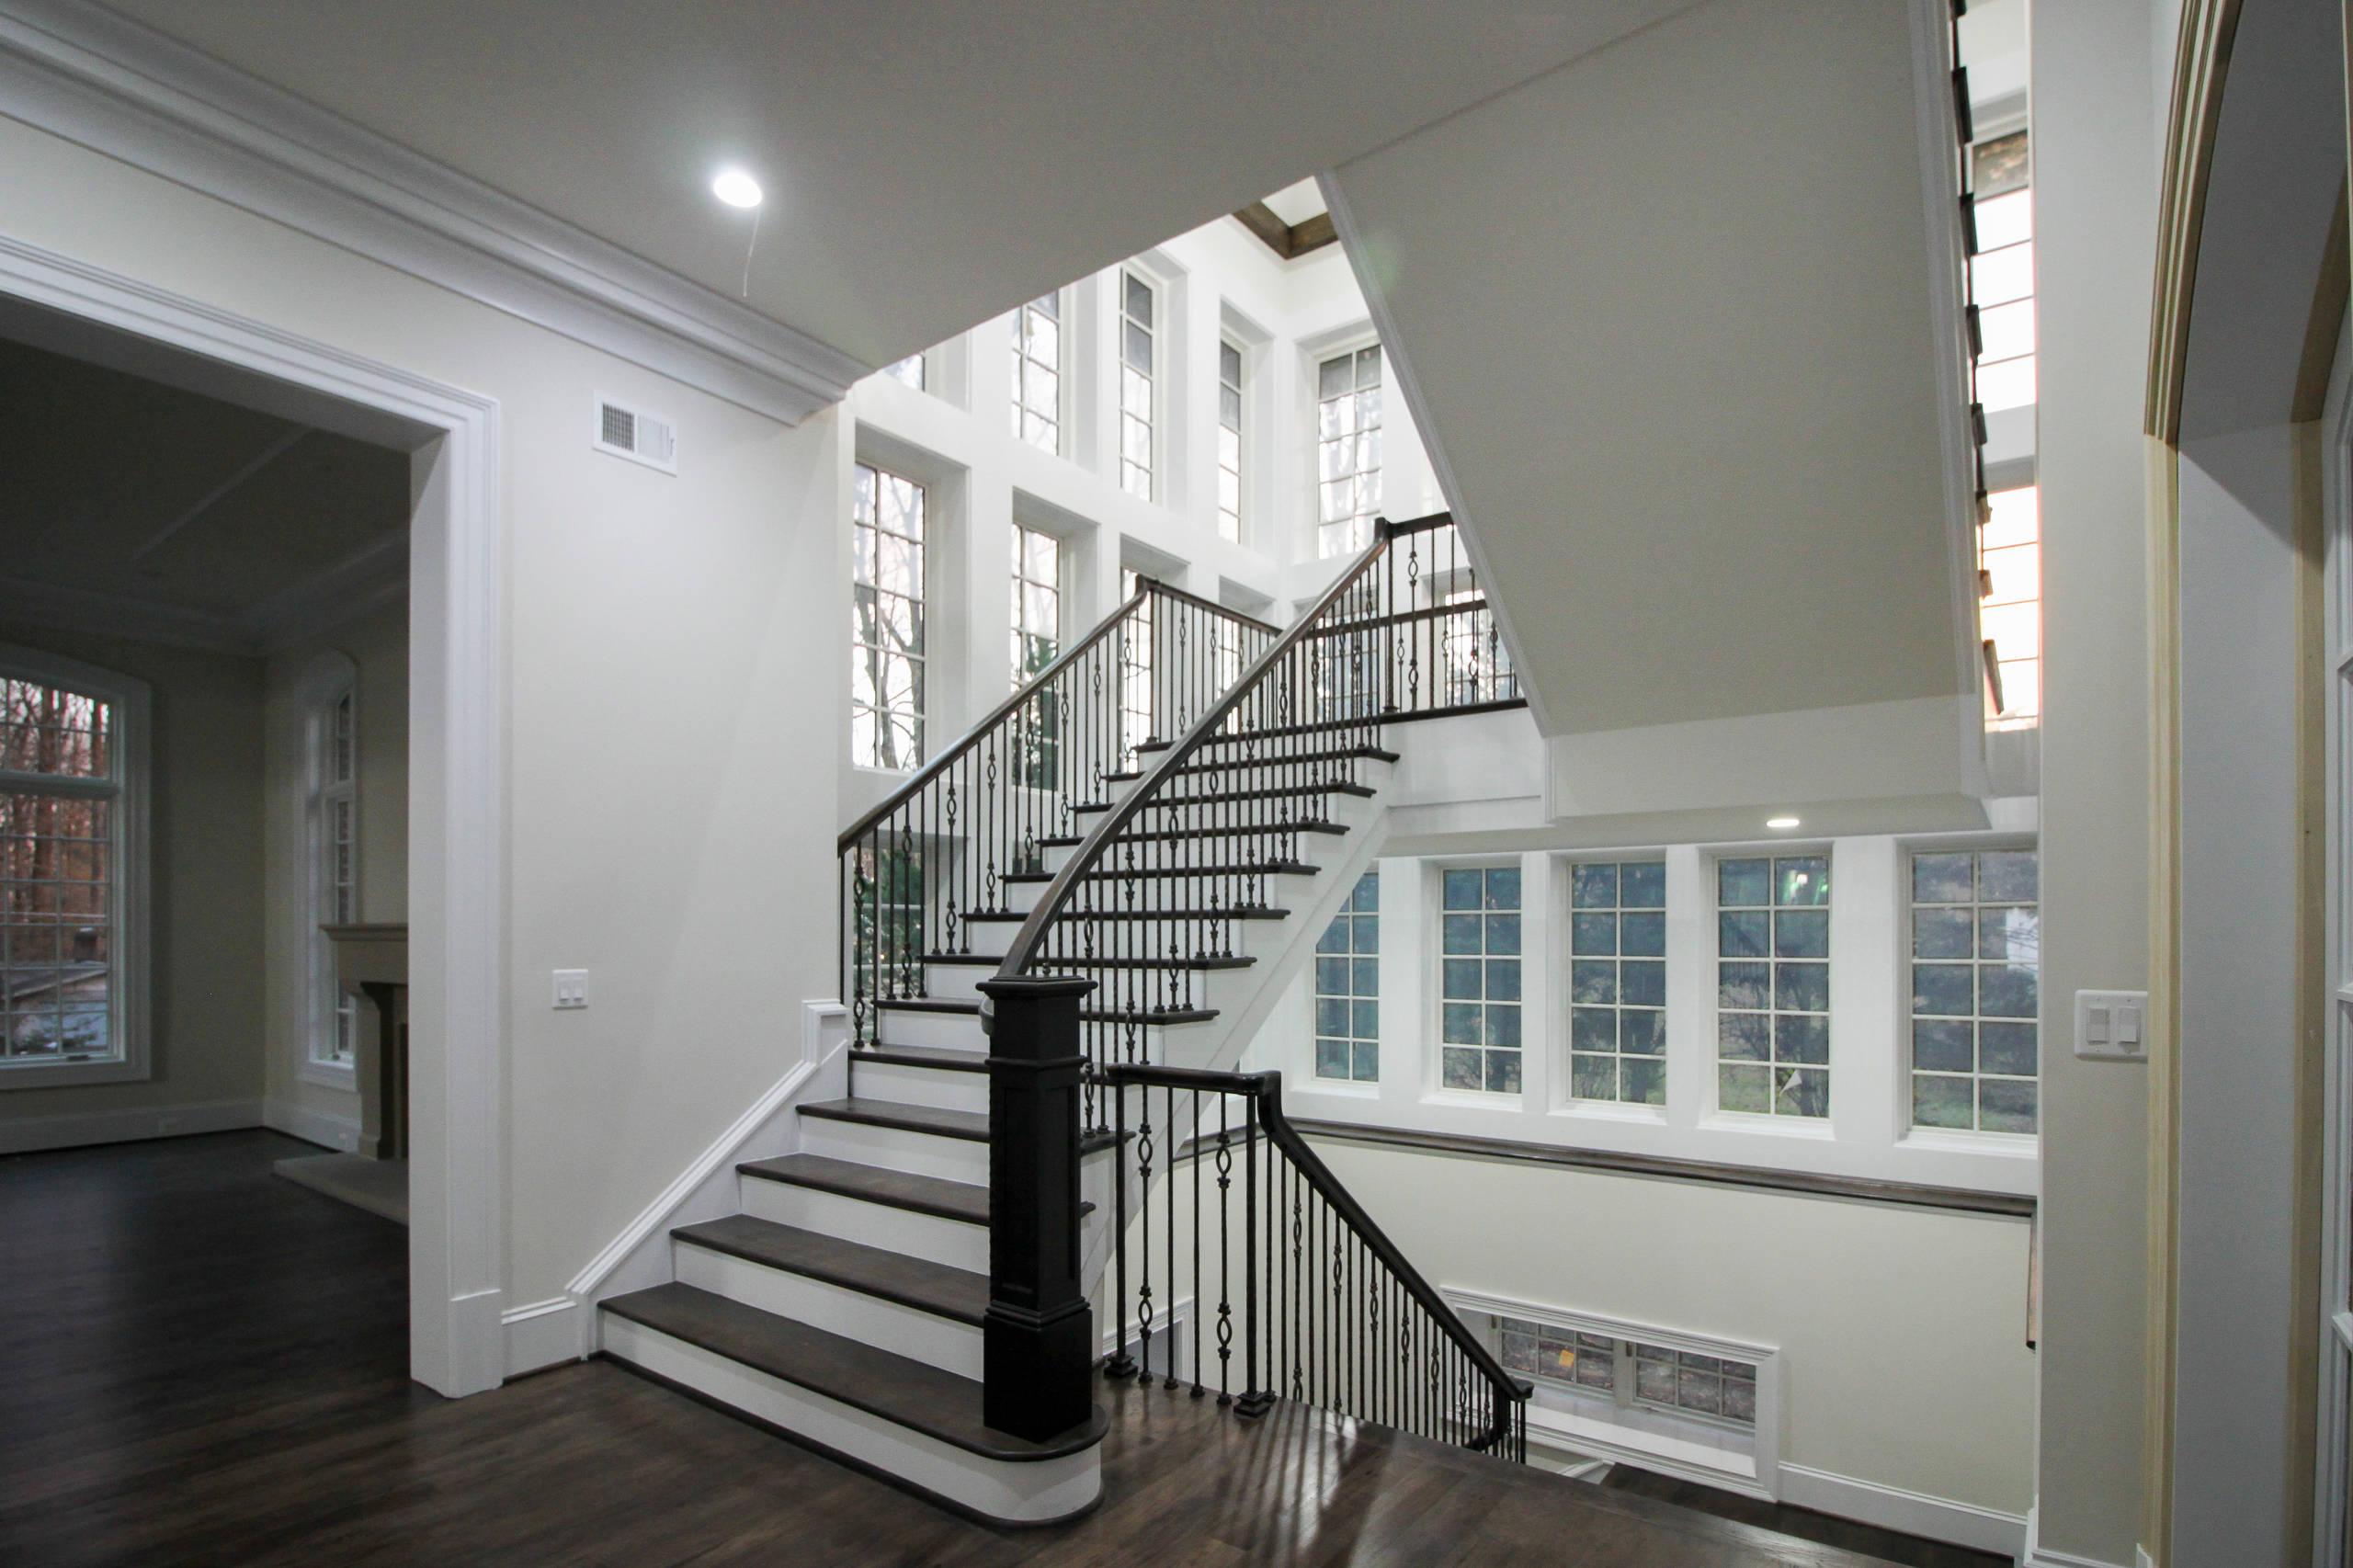 64_Freestanding Mezzanine Staircase, McLean VA 22101